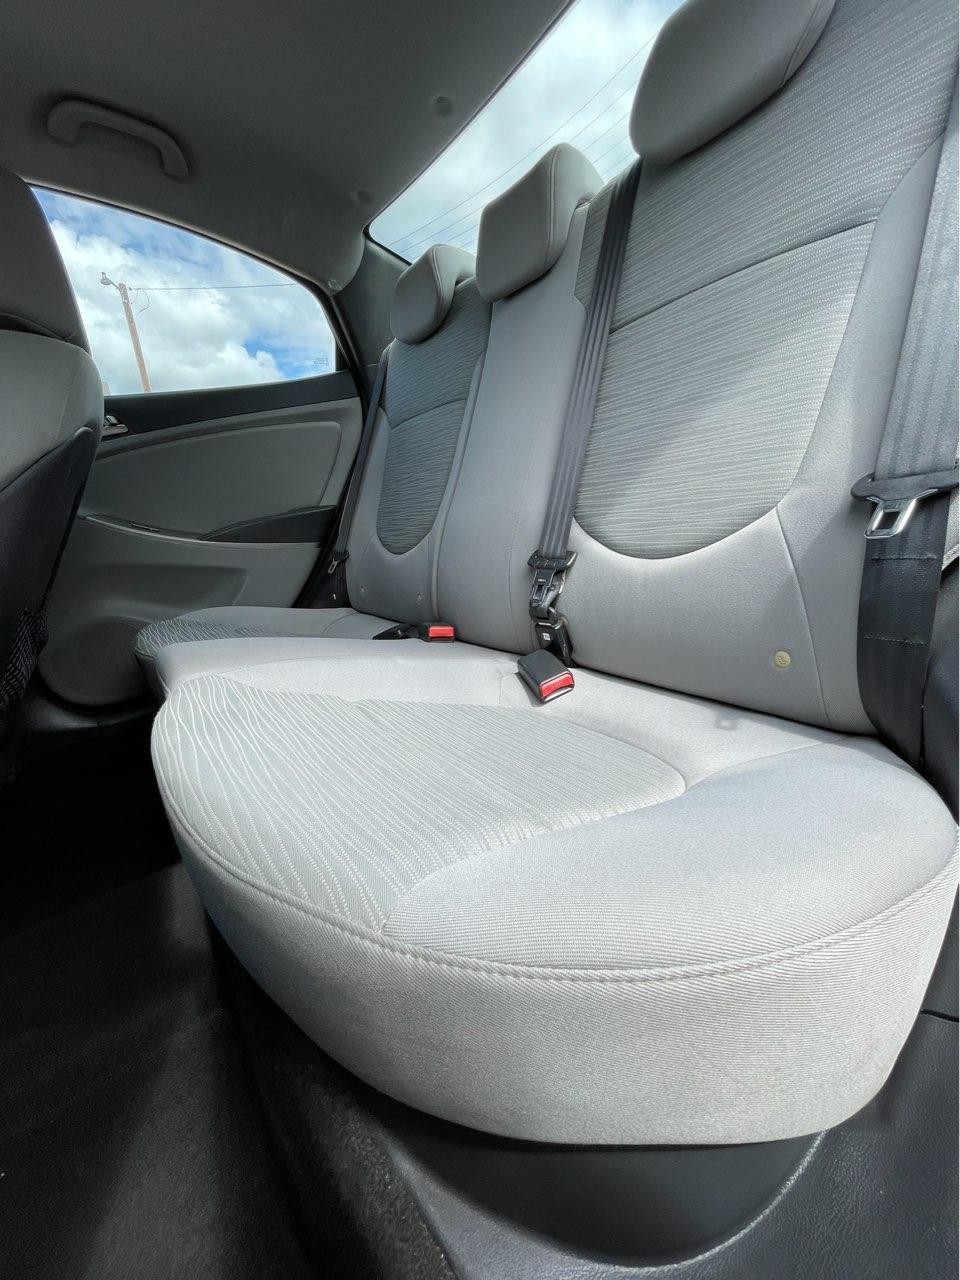 used vehicle - Sedan HYUNDAI ACCENT 2016